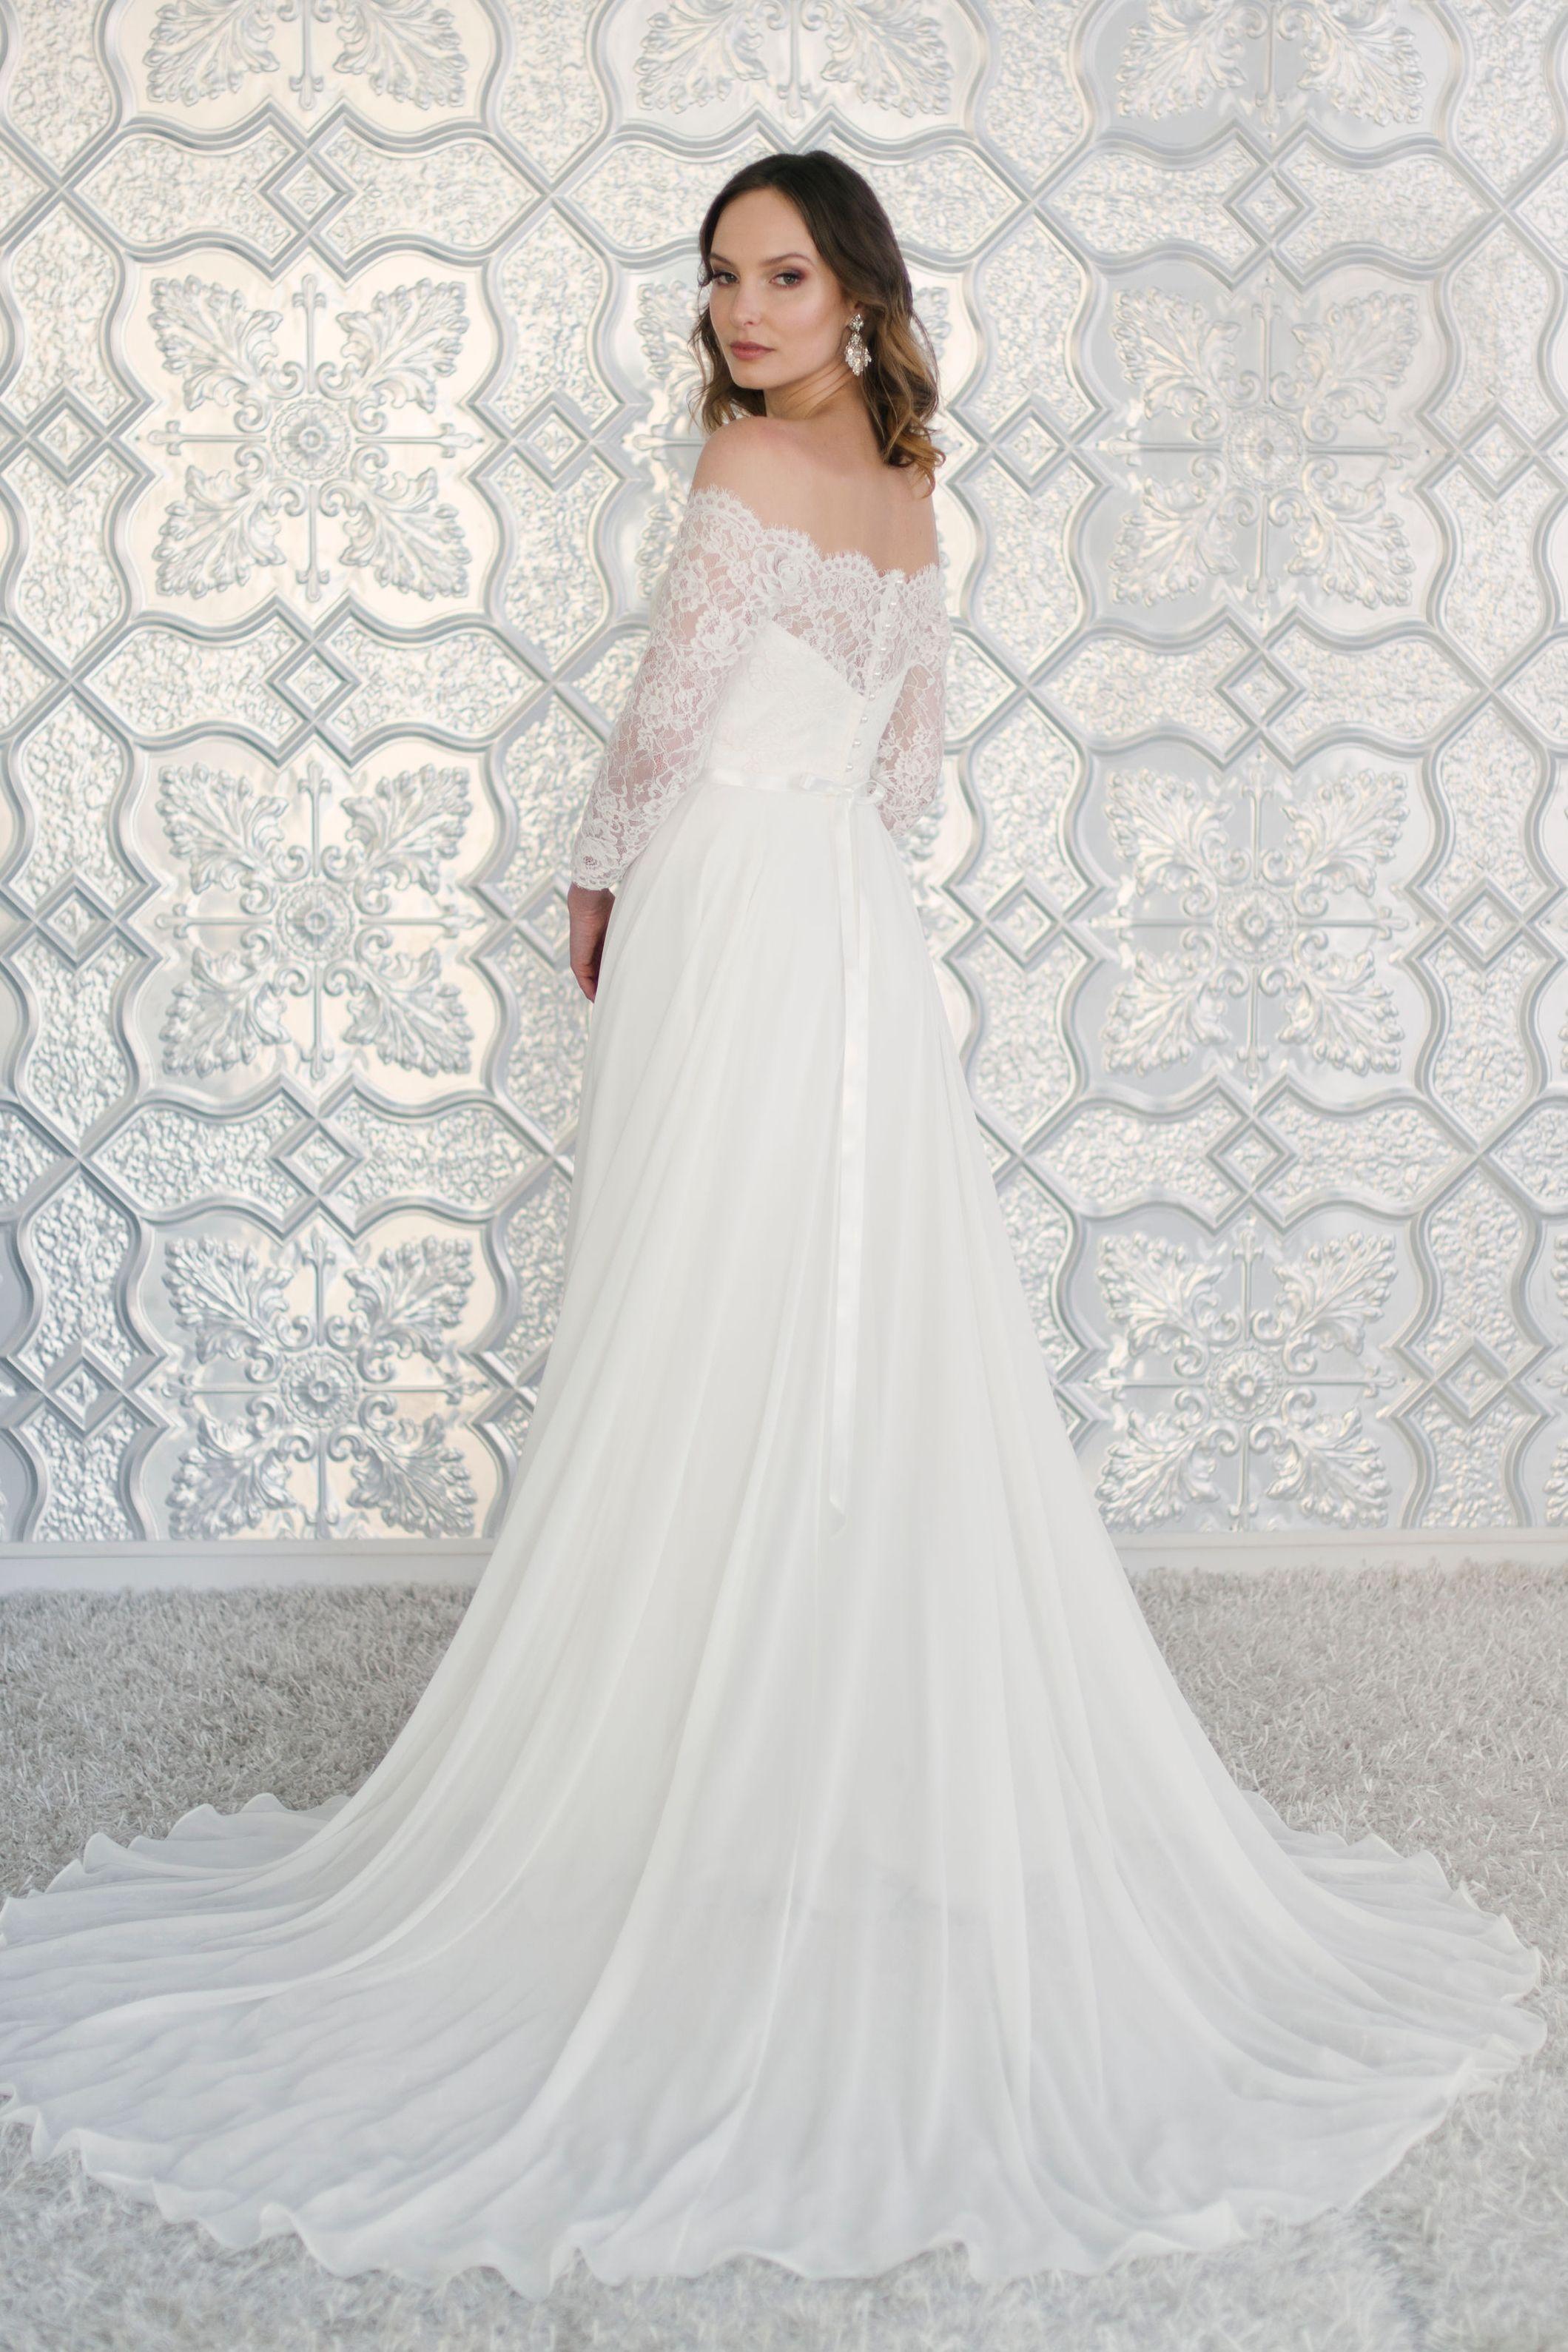 Carlie // Wendy Makin Bridal Designs // Ready to Wear